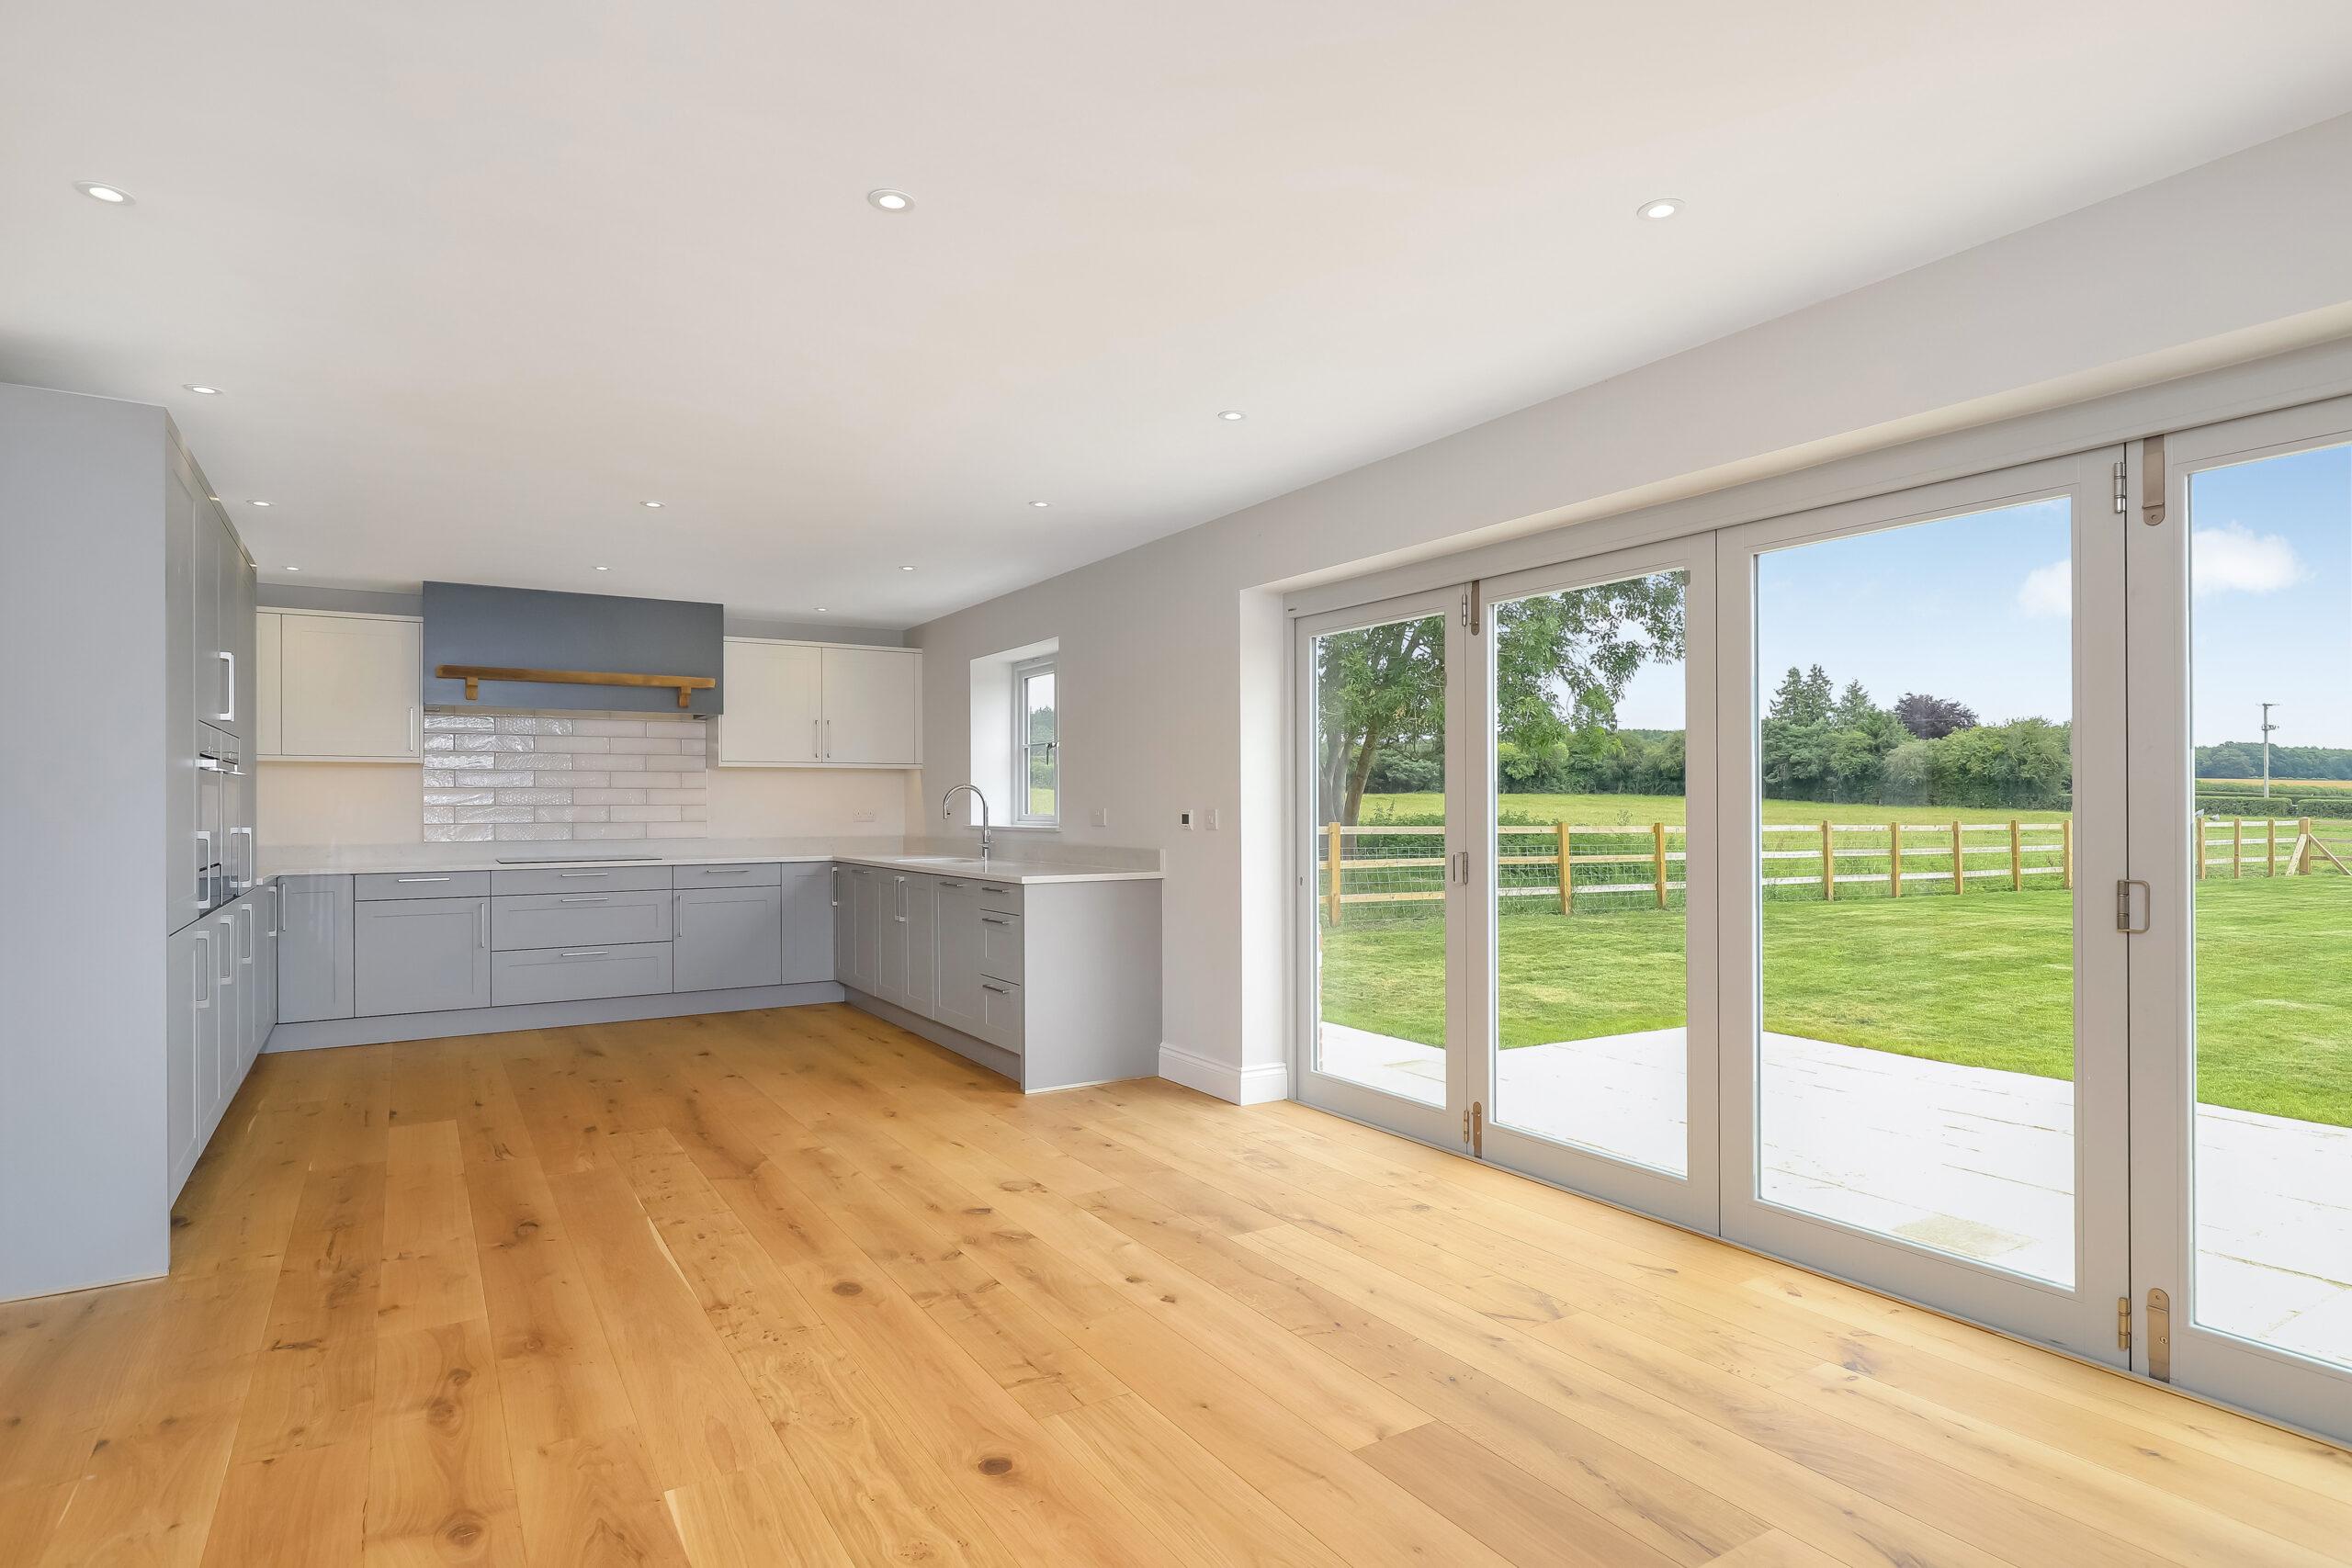 http://rbc-building.co.uk/wp-content/uploads/2020/09/Dove-Cottage-Kitchen-1-scaled.jpg